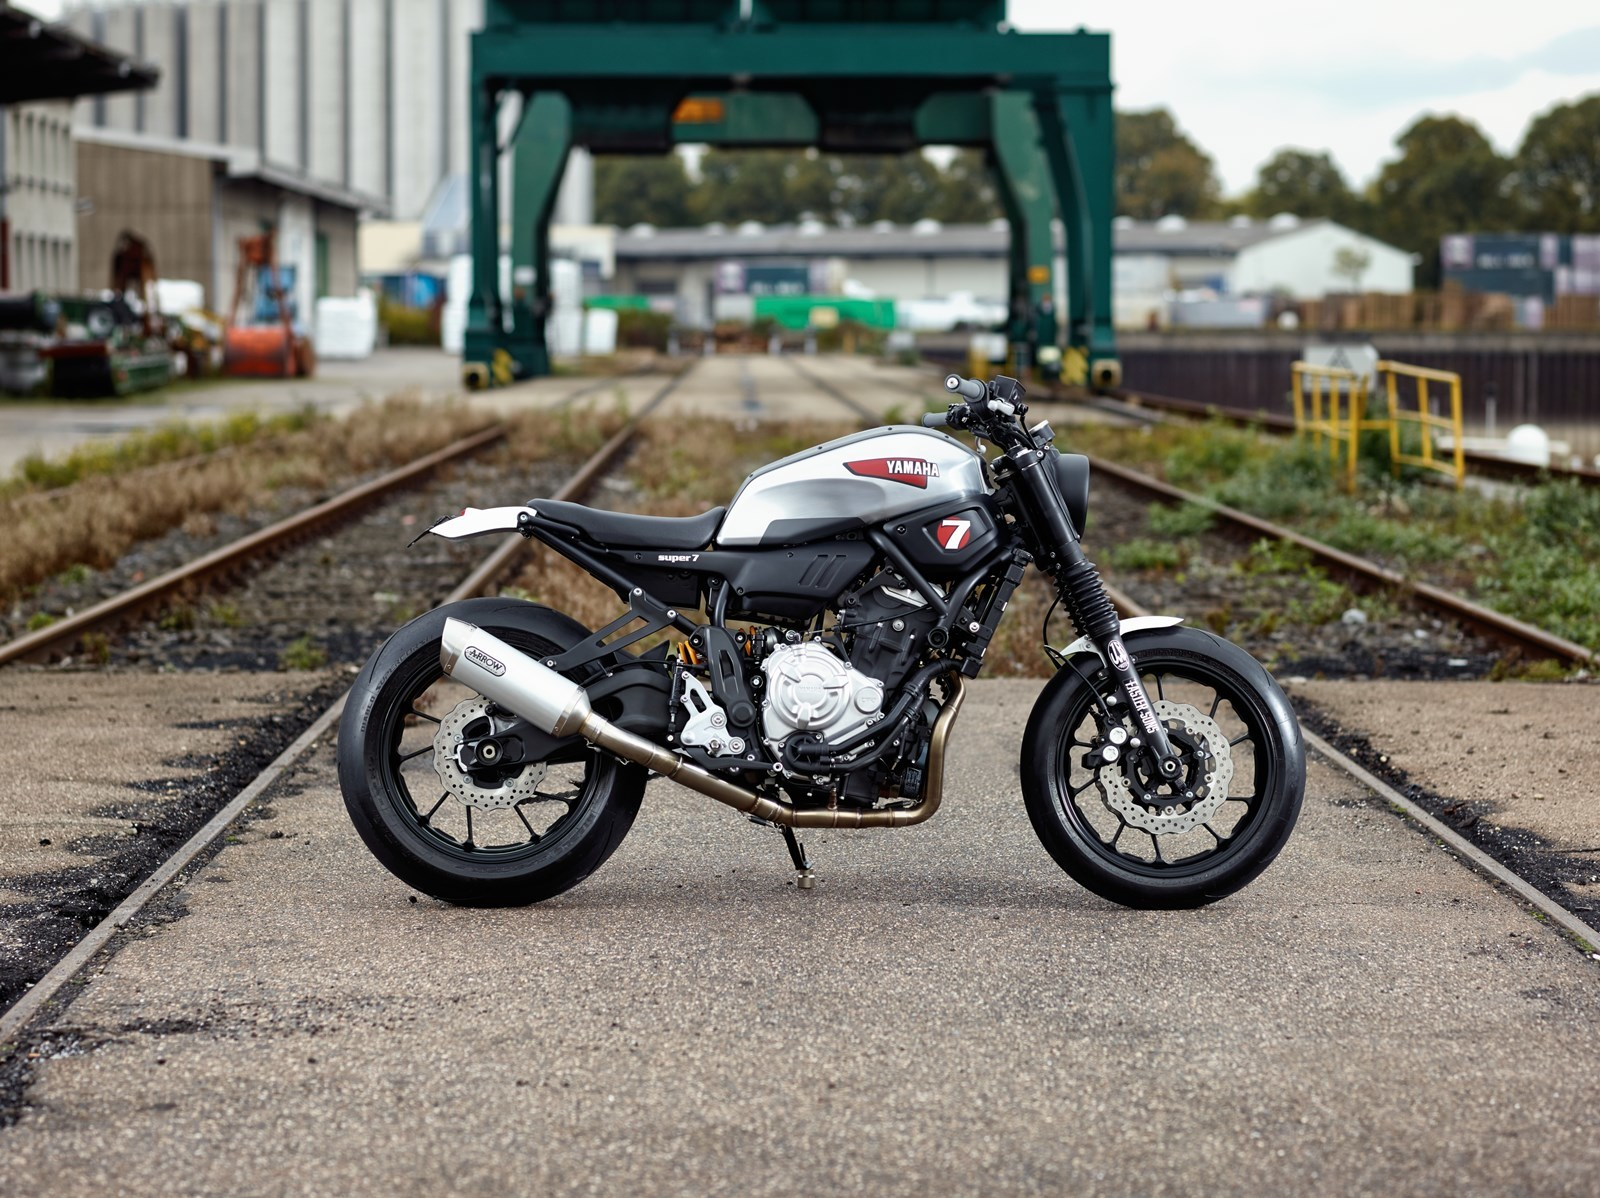 Foto de Yamaha XSR700 Super 7 by JvB-Moto (8/25)